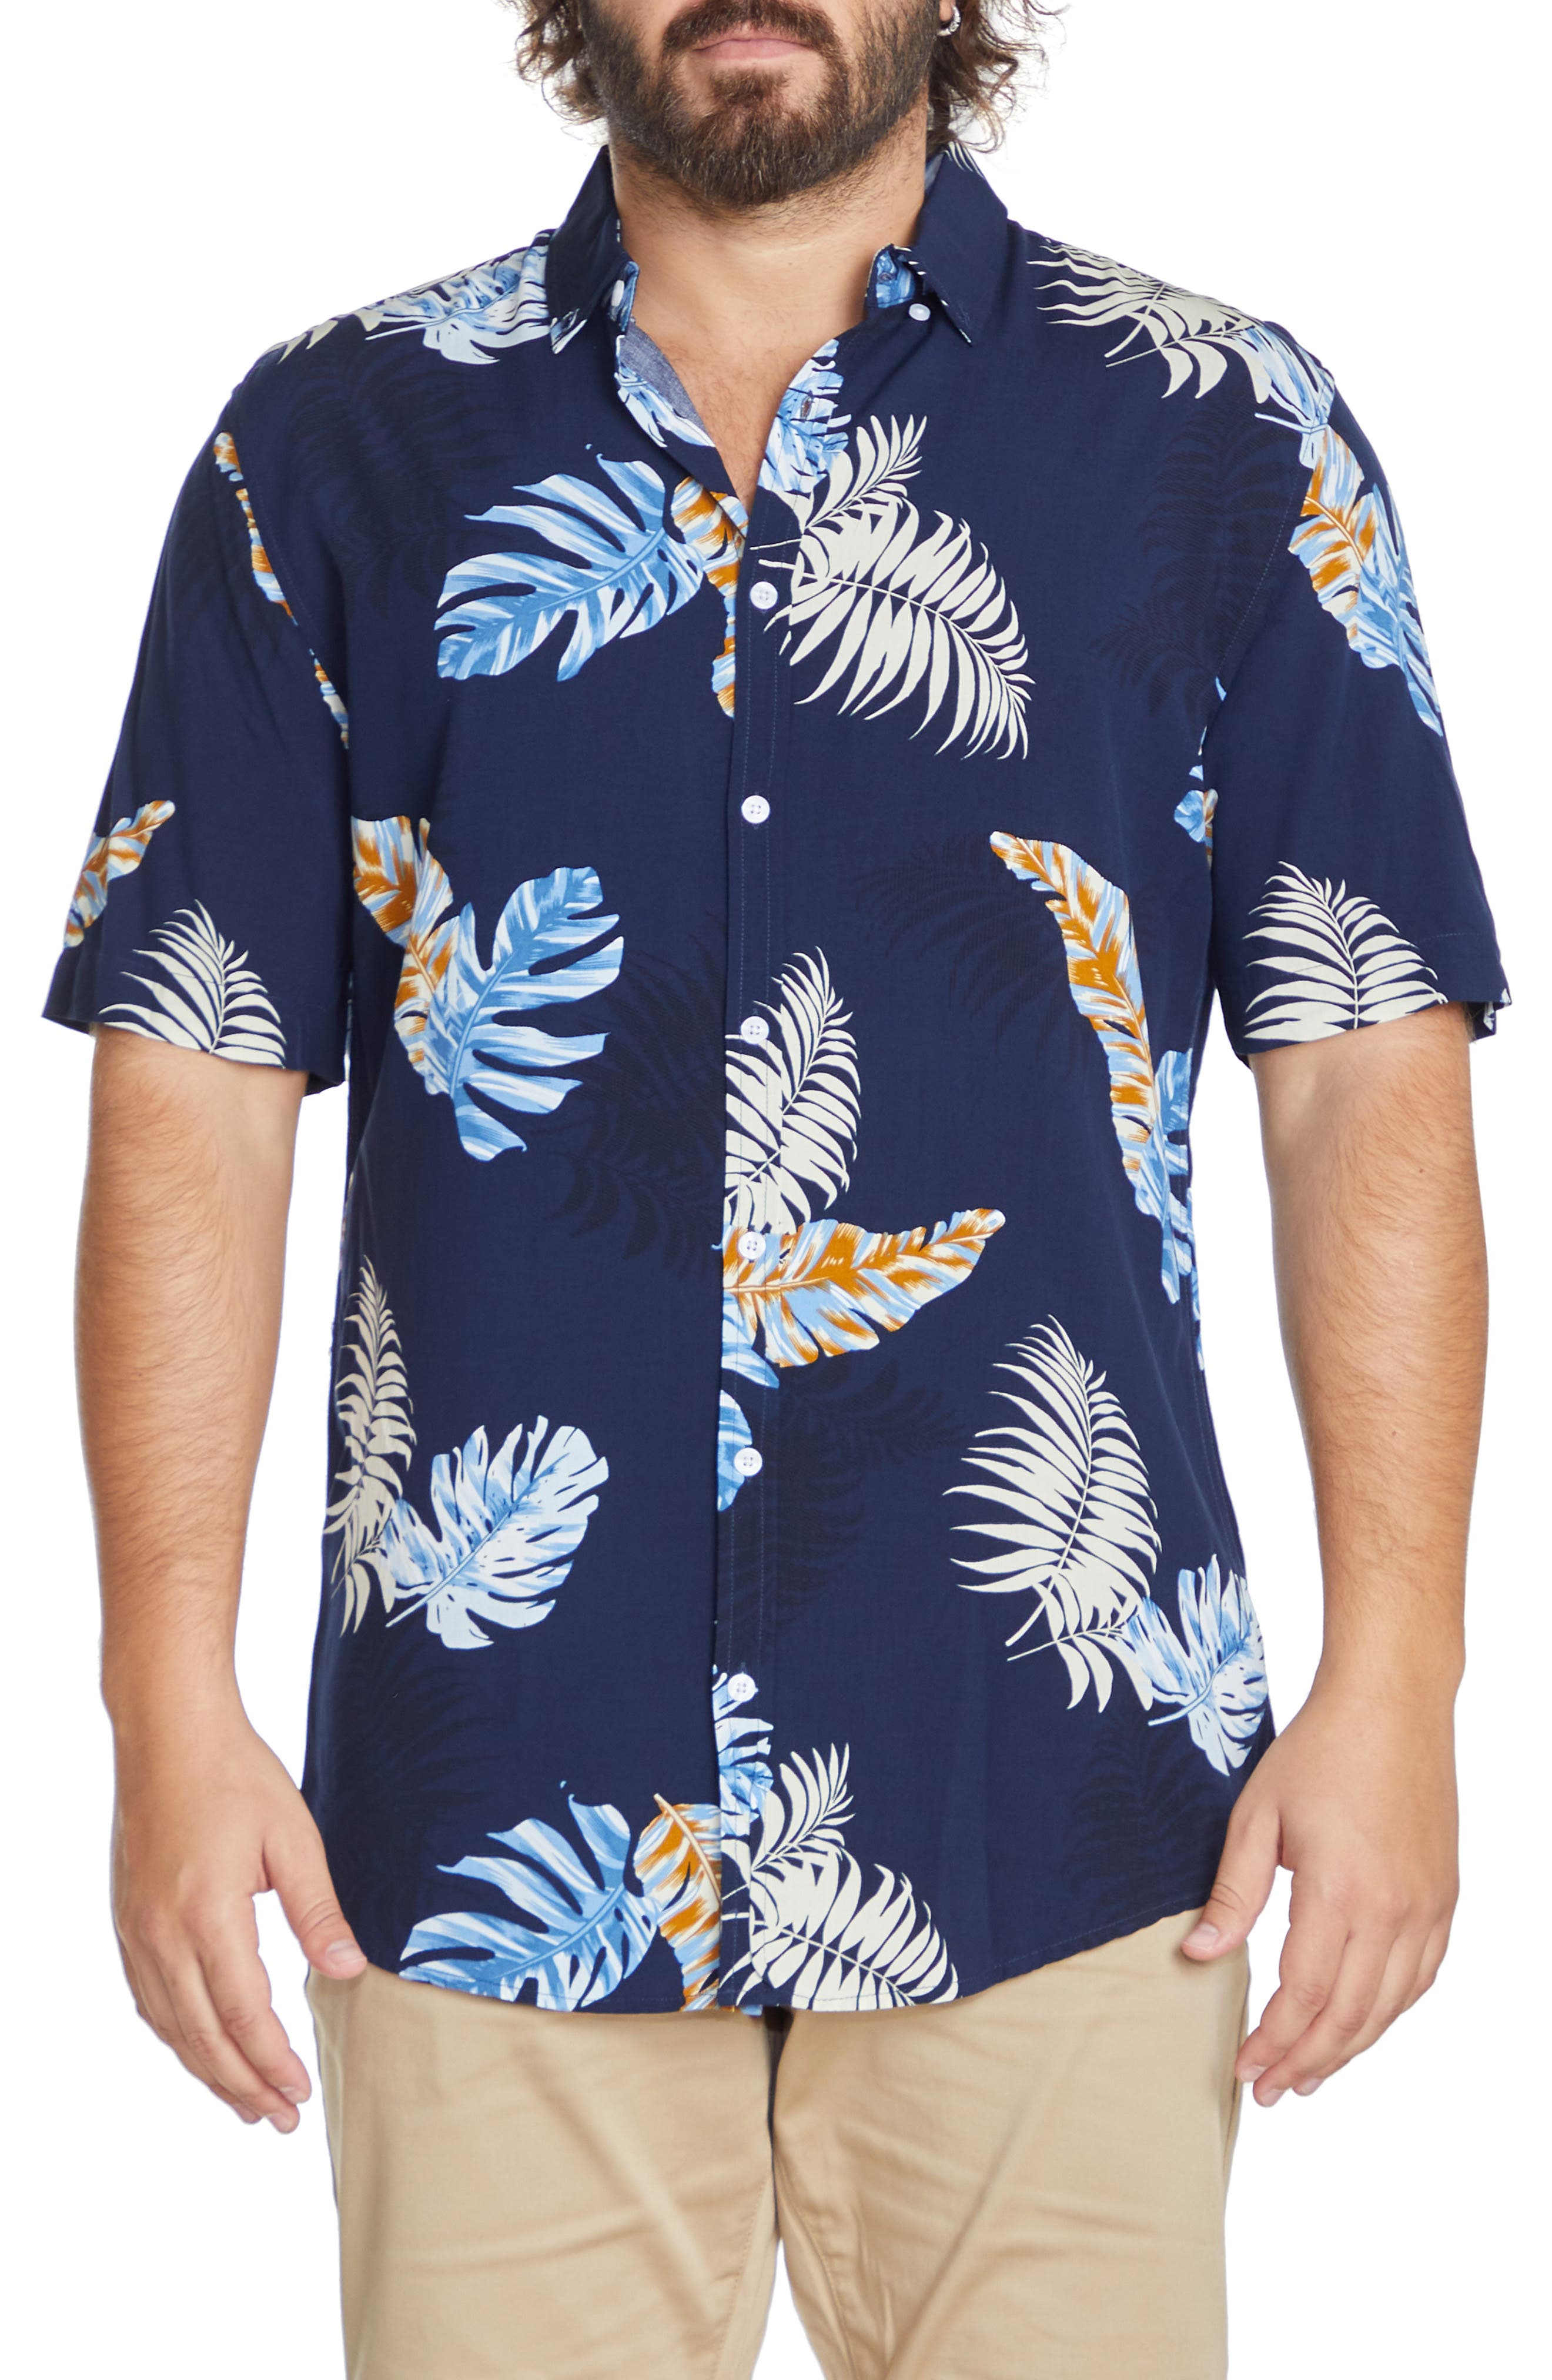 Kauai Tropical Short Sleeve Button-Up Shirt